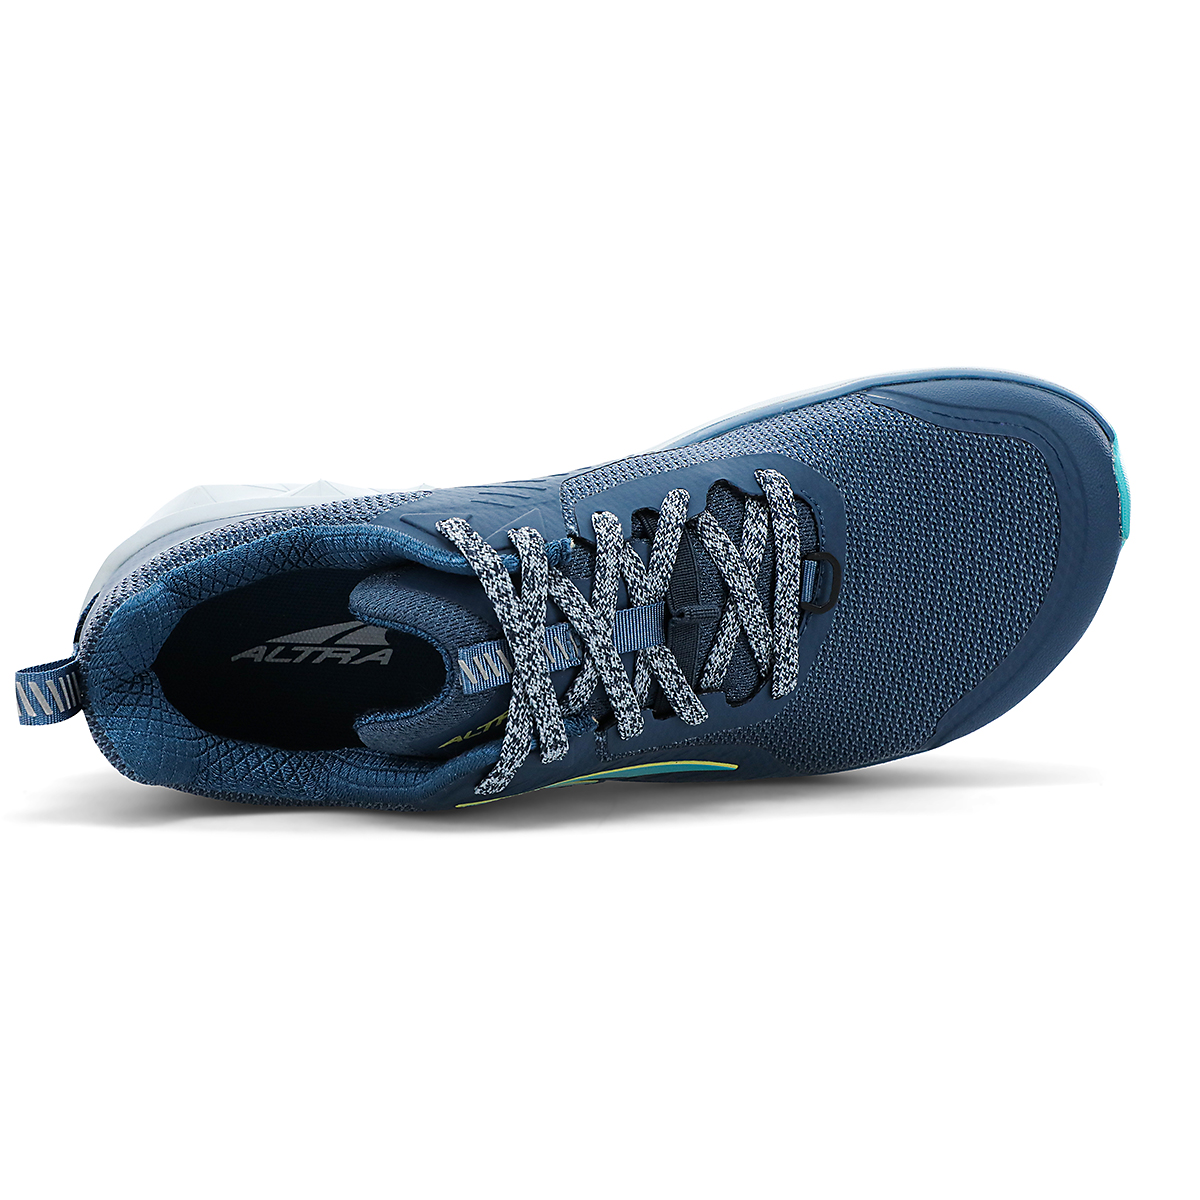 Women's Altra Timp 3 Trail Running Shoe - Color: Dark Blue - Size: 6 - Width: Regular, Dark Blue, large, image 3